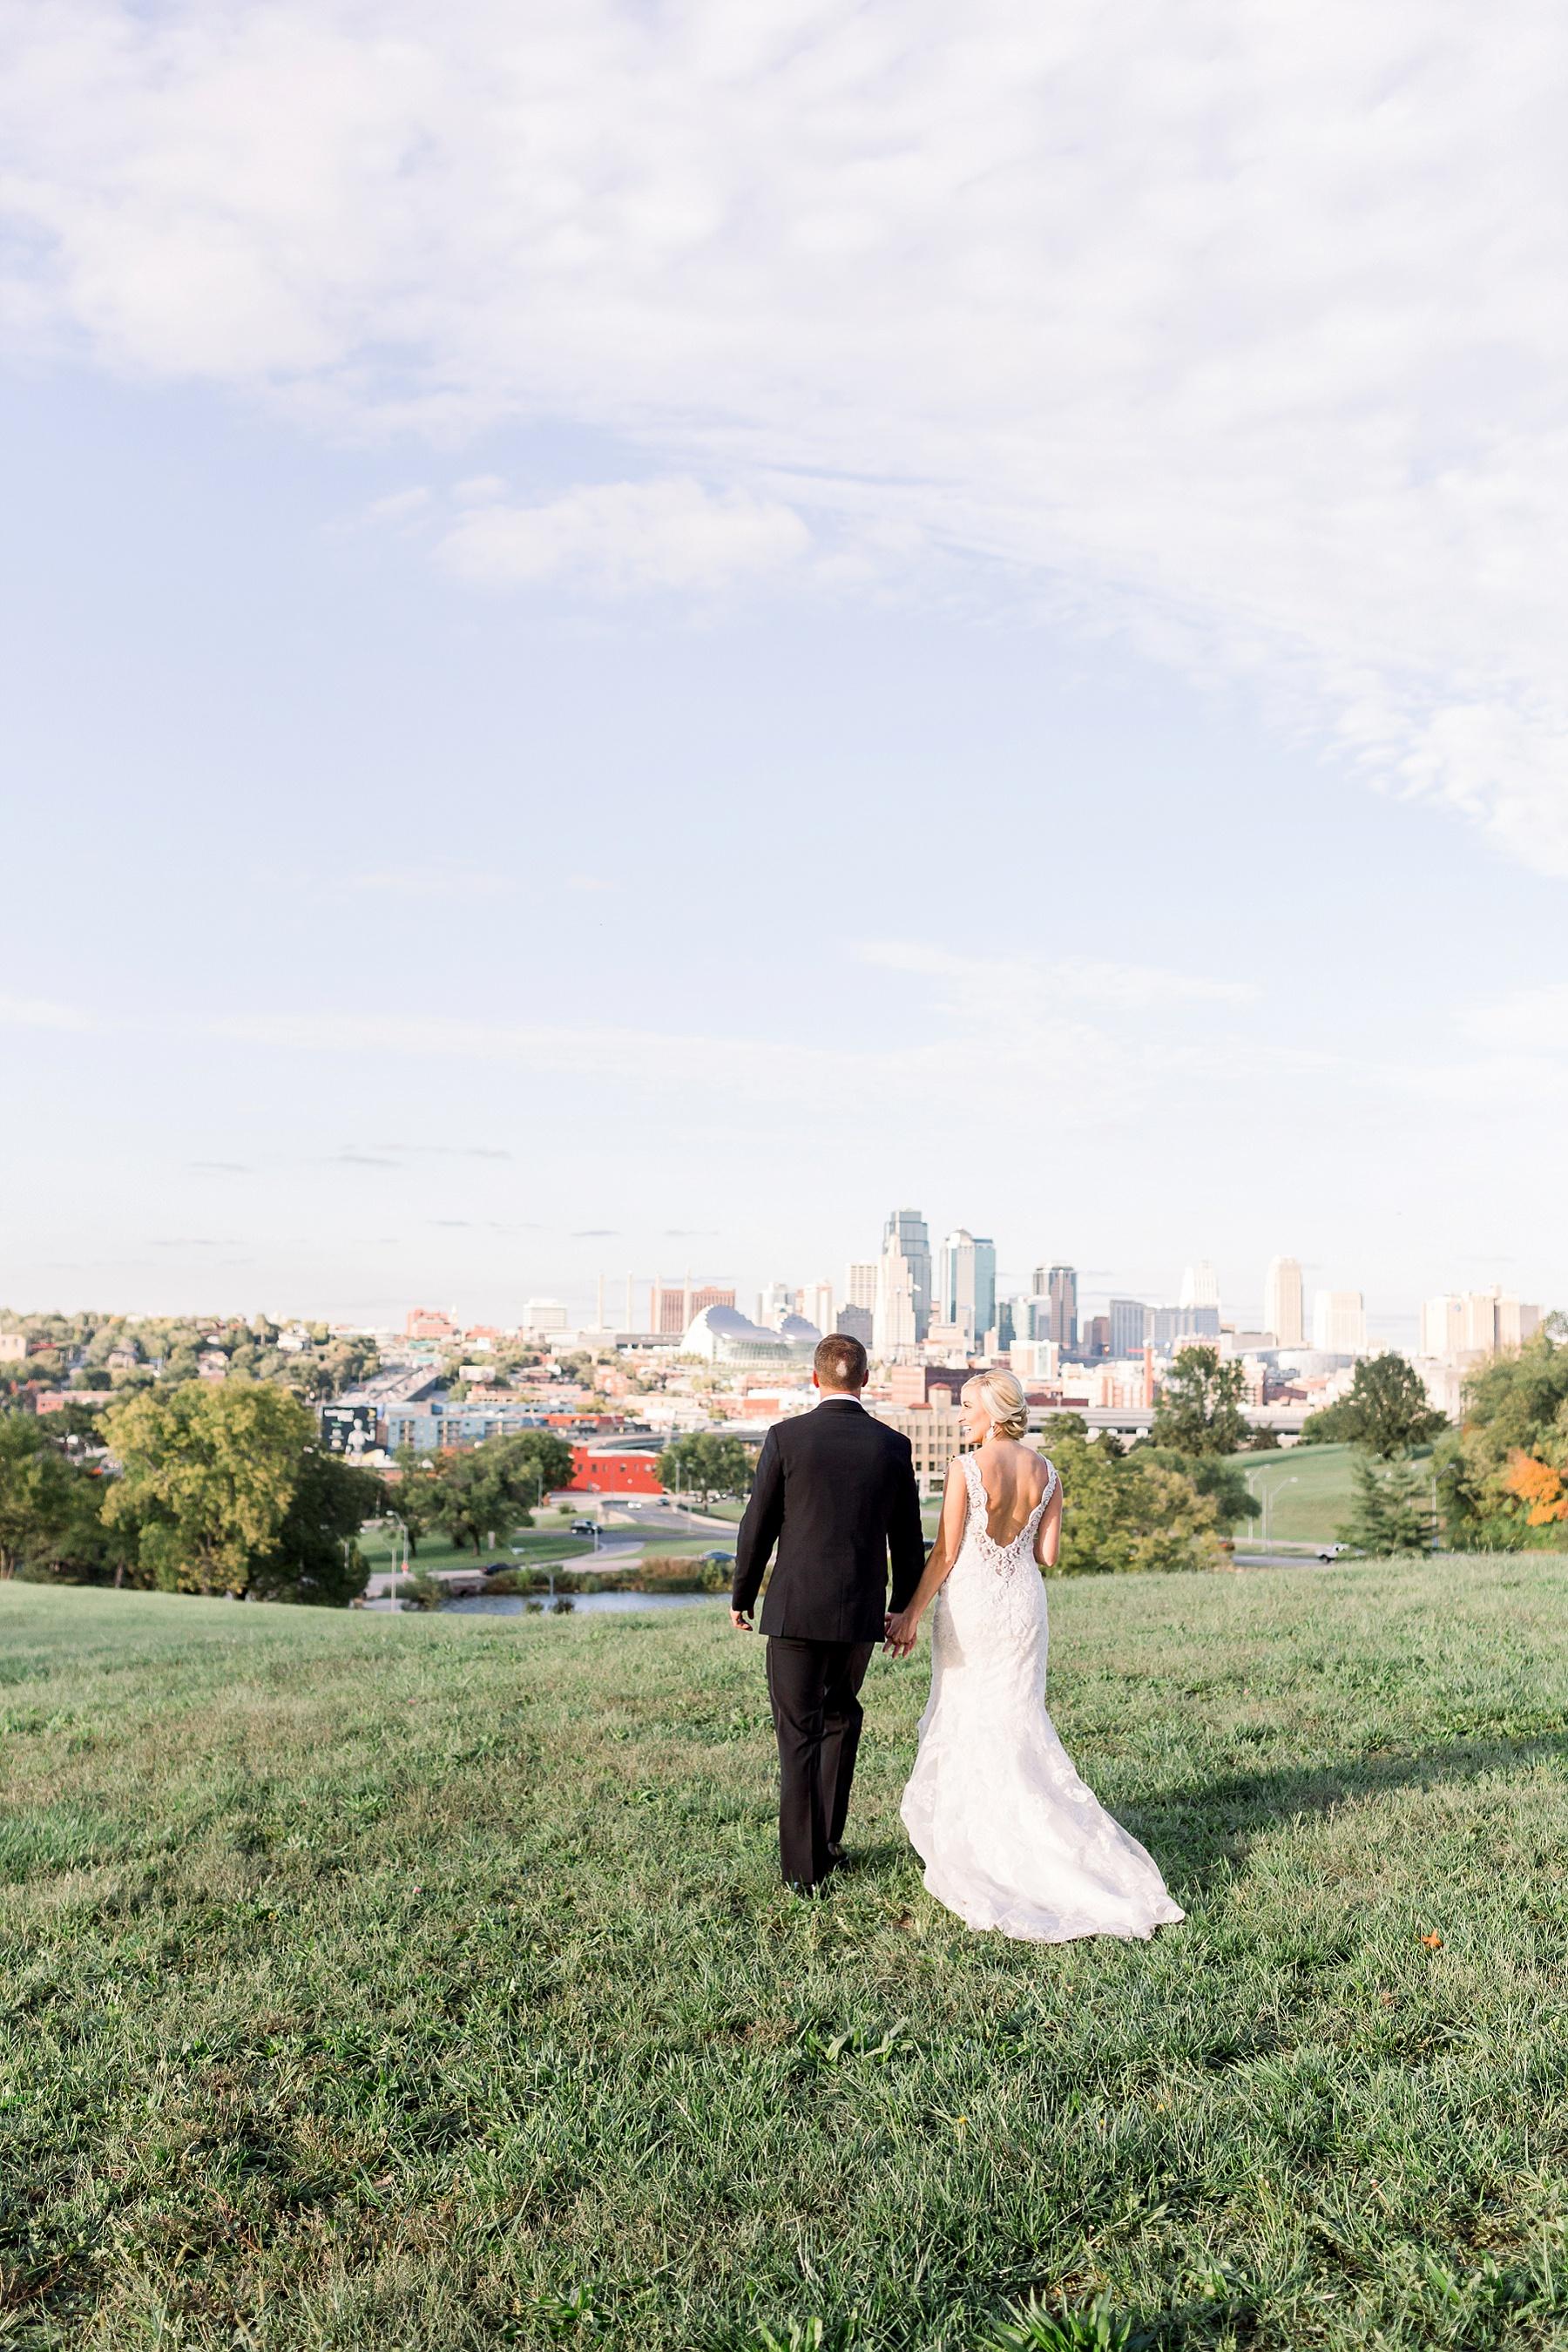 midwest-adventurous-wedding-photographer-elizabeth-ladean-photography-photo_4787.jpg